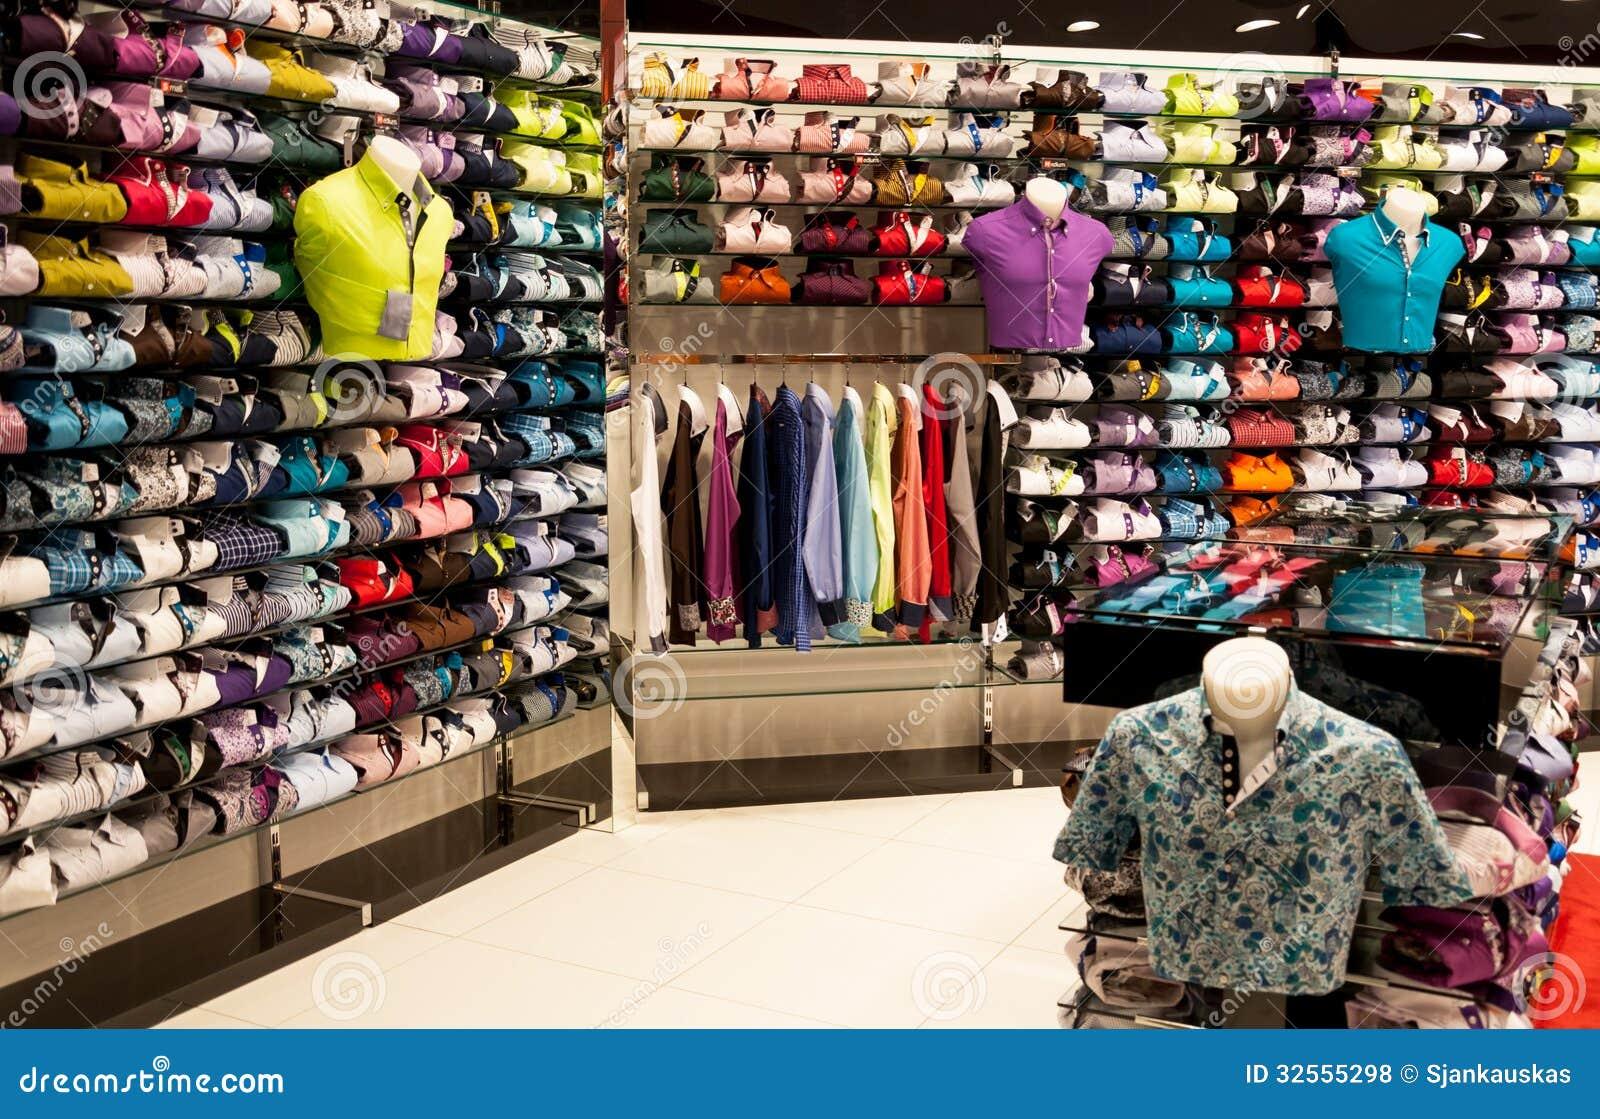 best service 8e1e7 cecea Shirts shop interior stock photo. Image of clothes, design ...